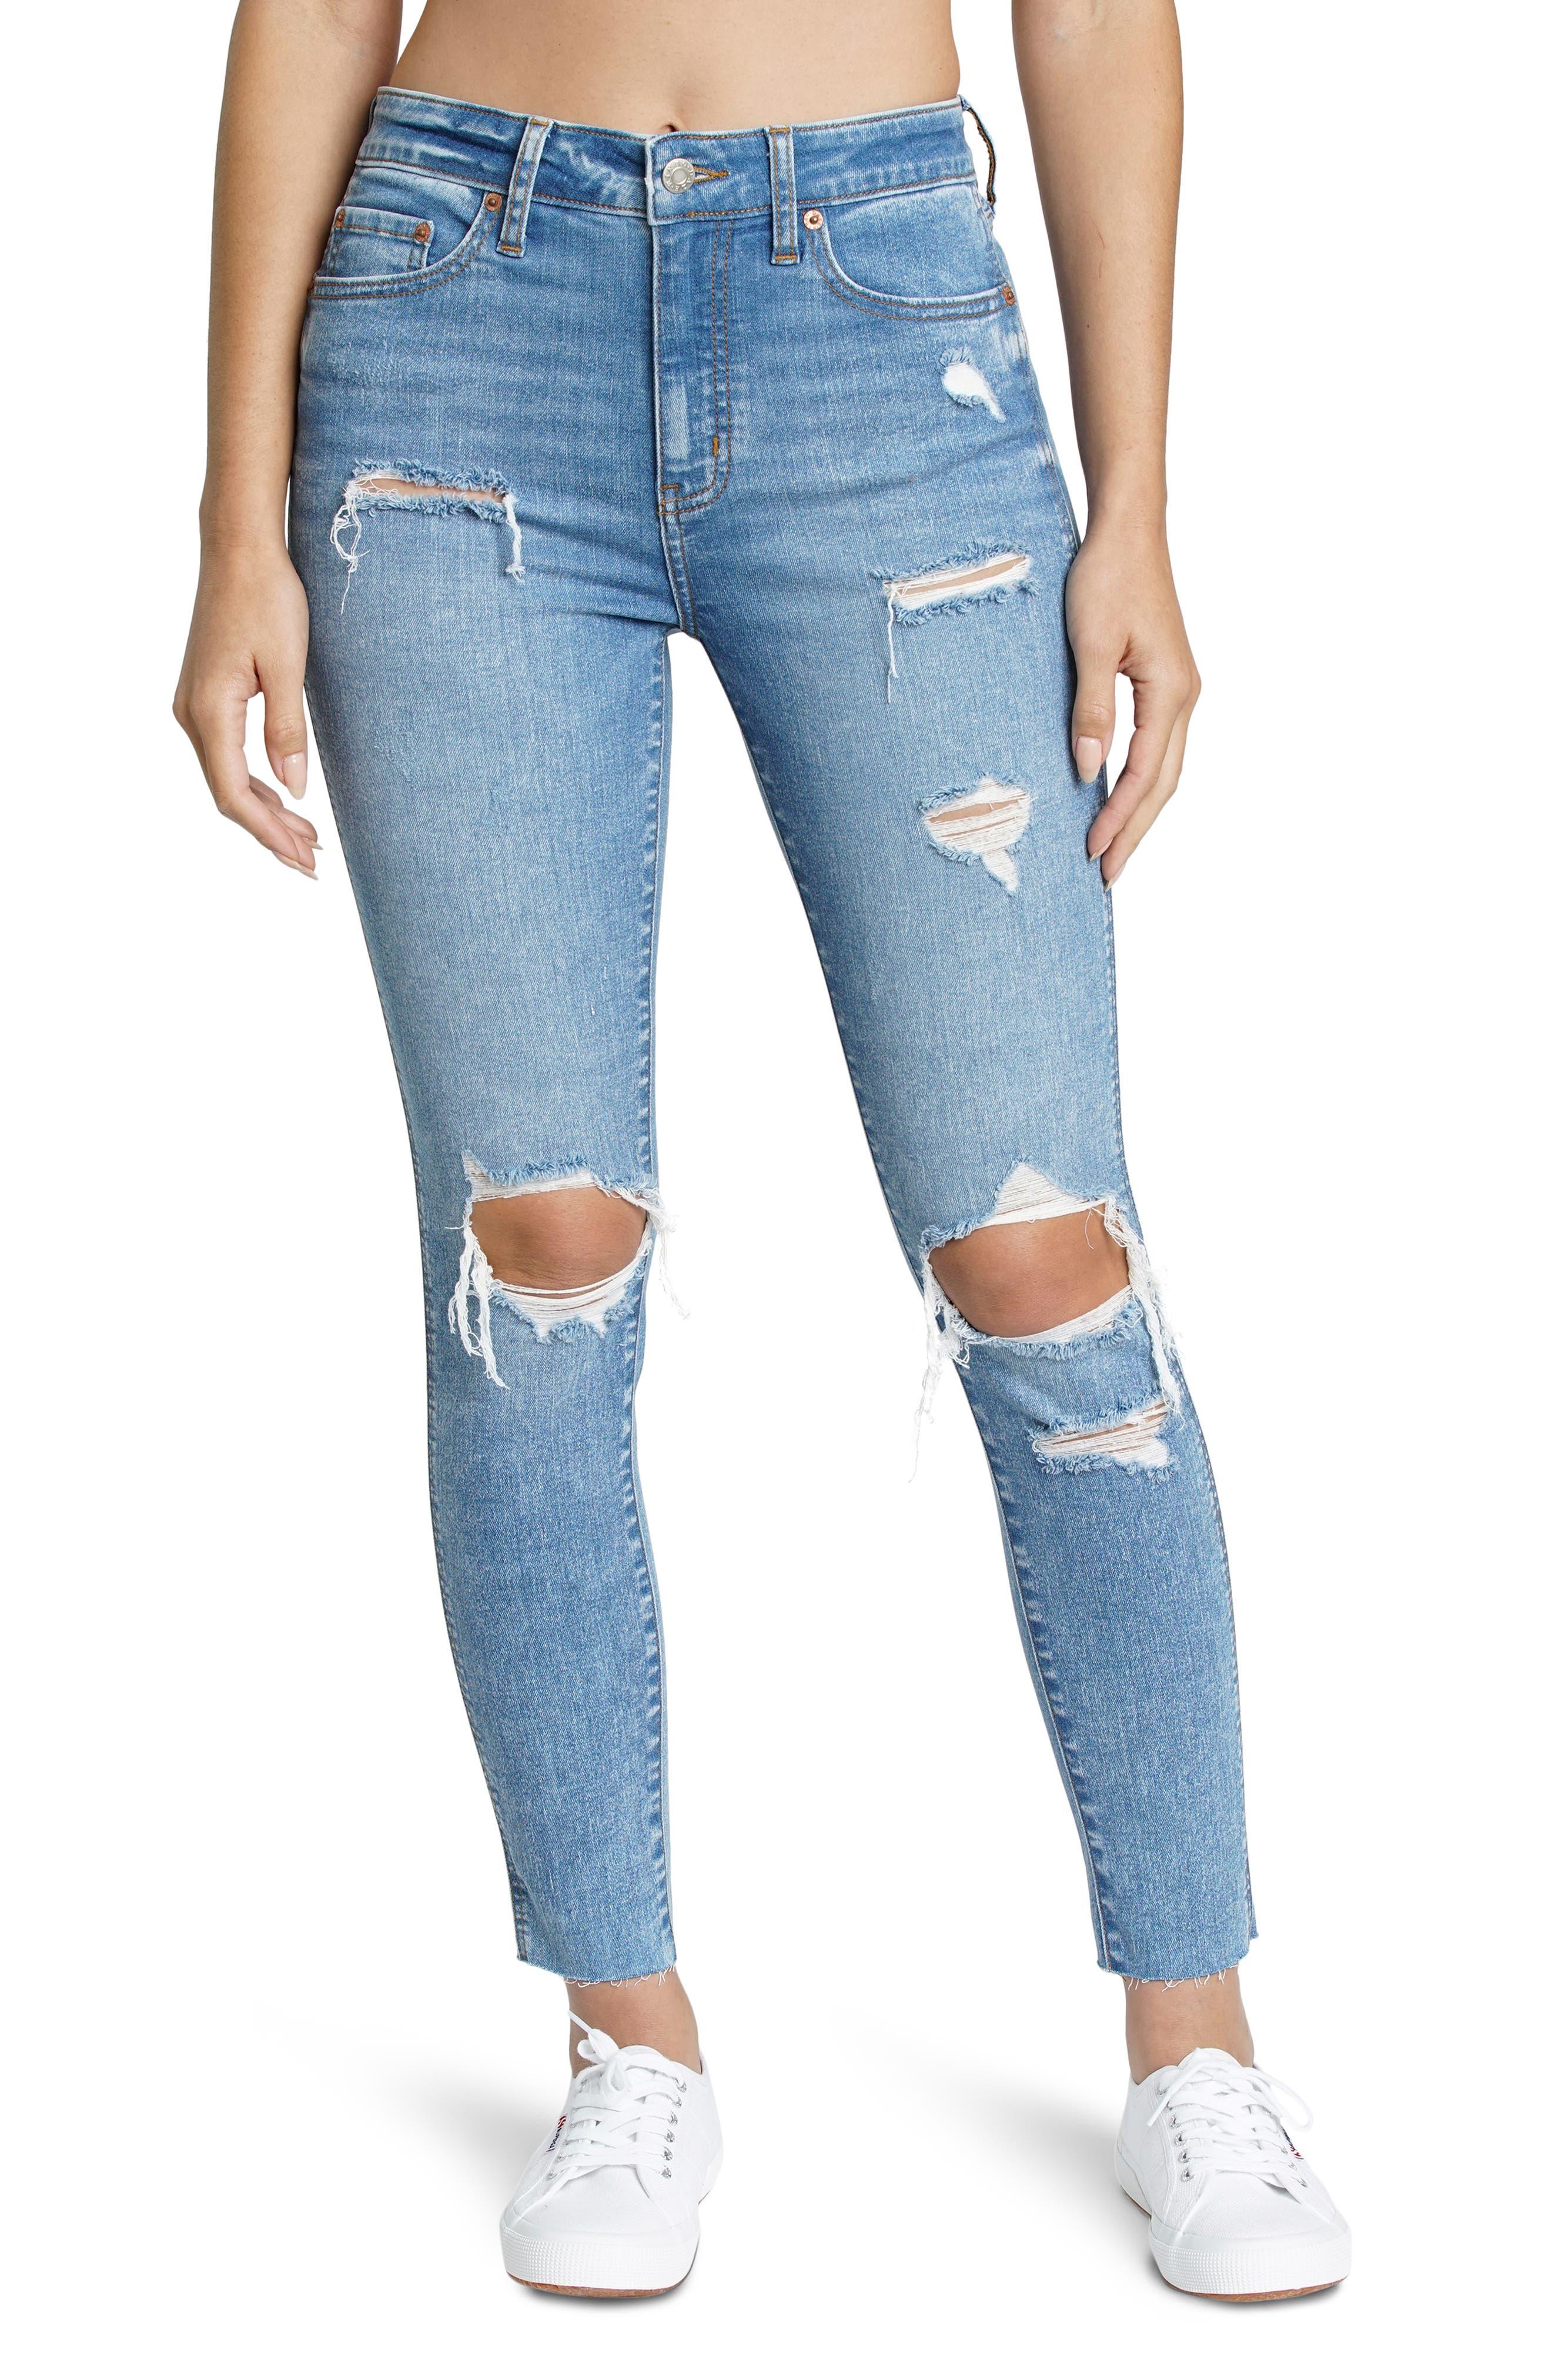 Money Maker Vintage Ripped High Waist Jeans